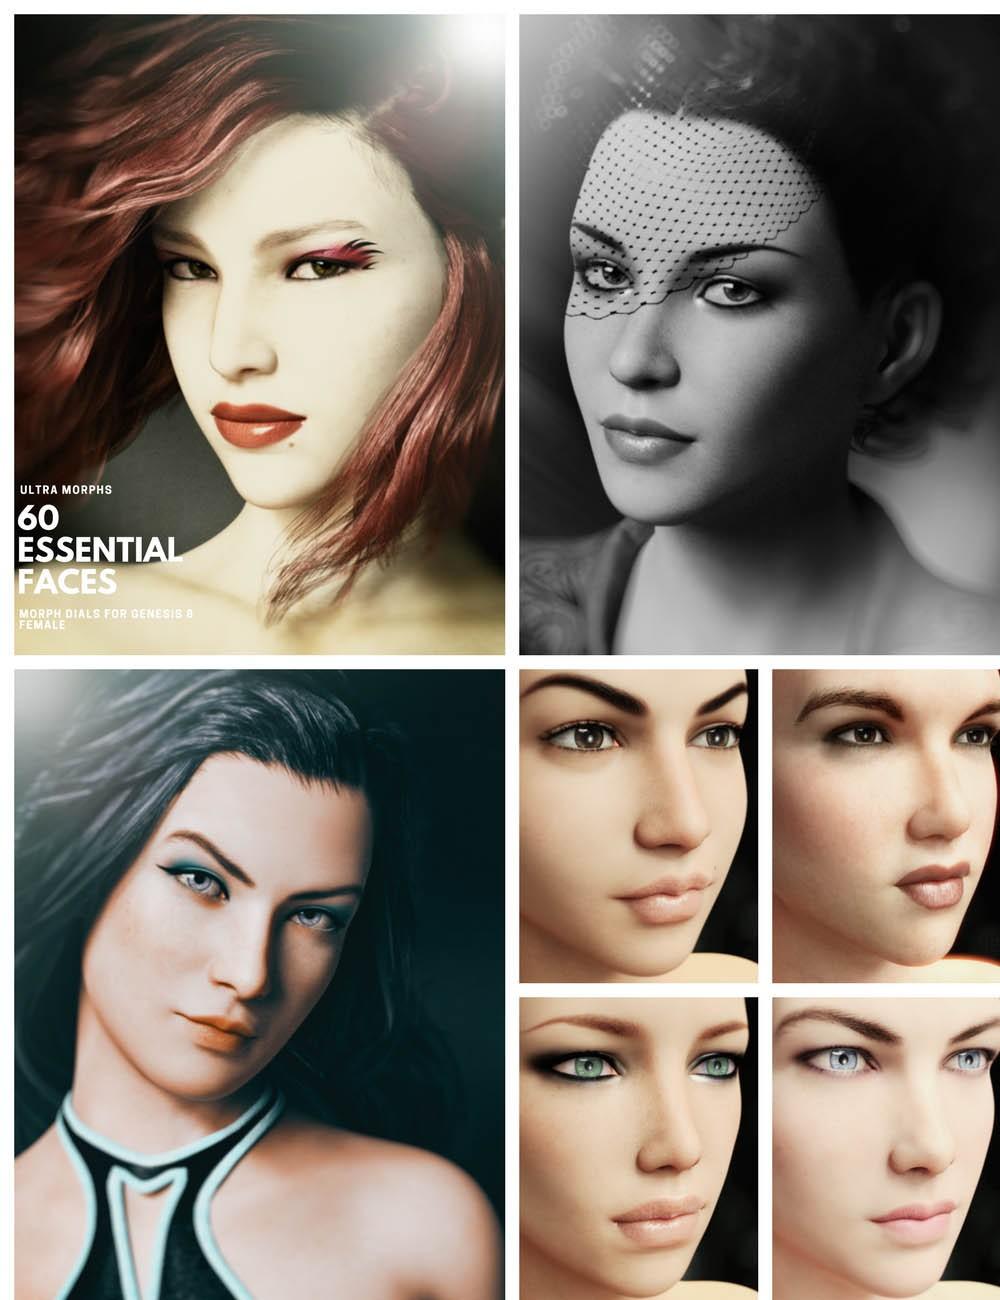 Download DAZ Studio 3 for FREE!: DAZ 3D - Ultra Morphs - 60